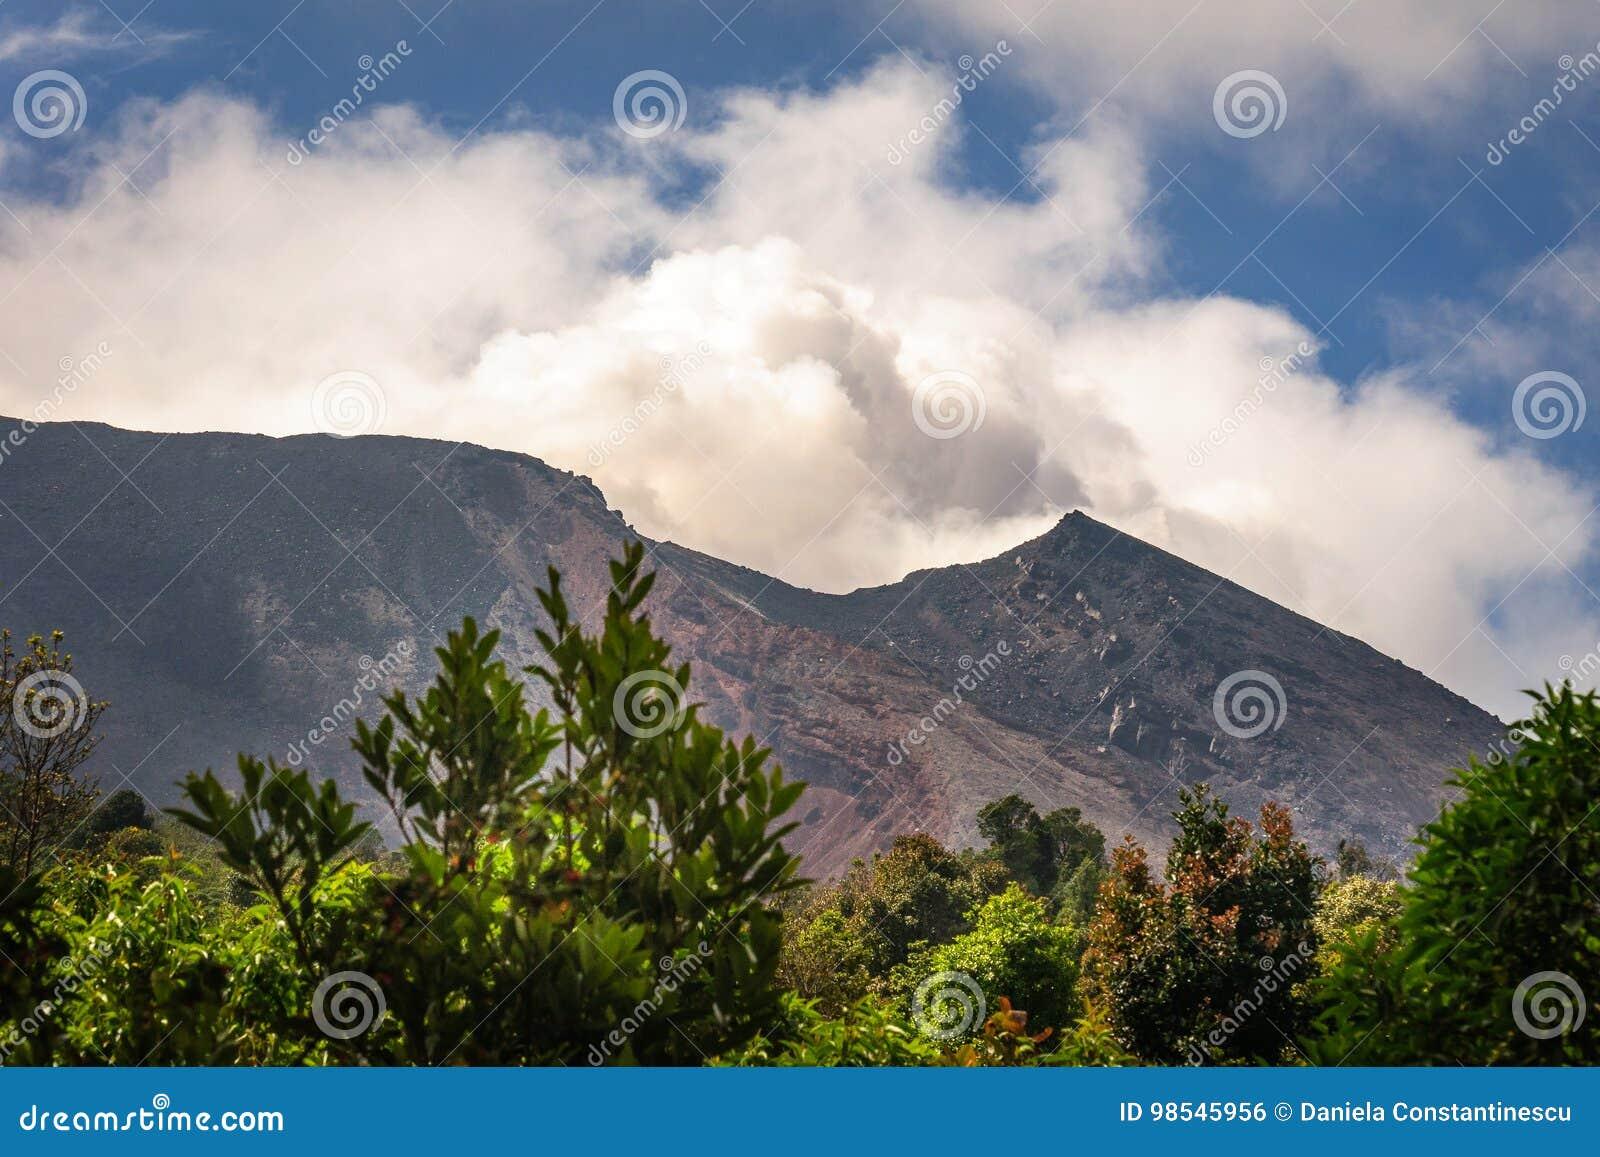 Alguma atividade de Strombolian em Volcano Pacaya, Guatemala